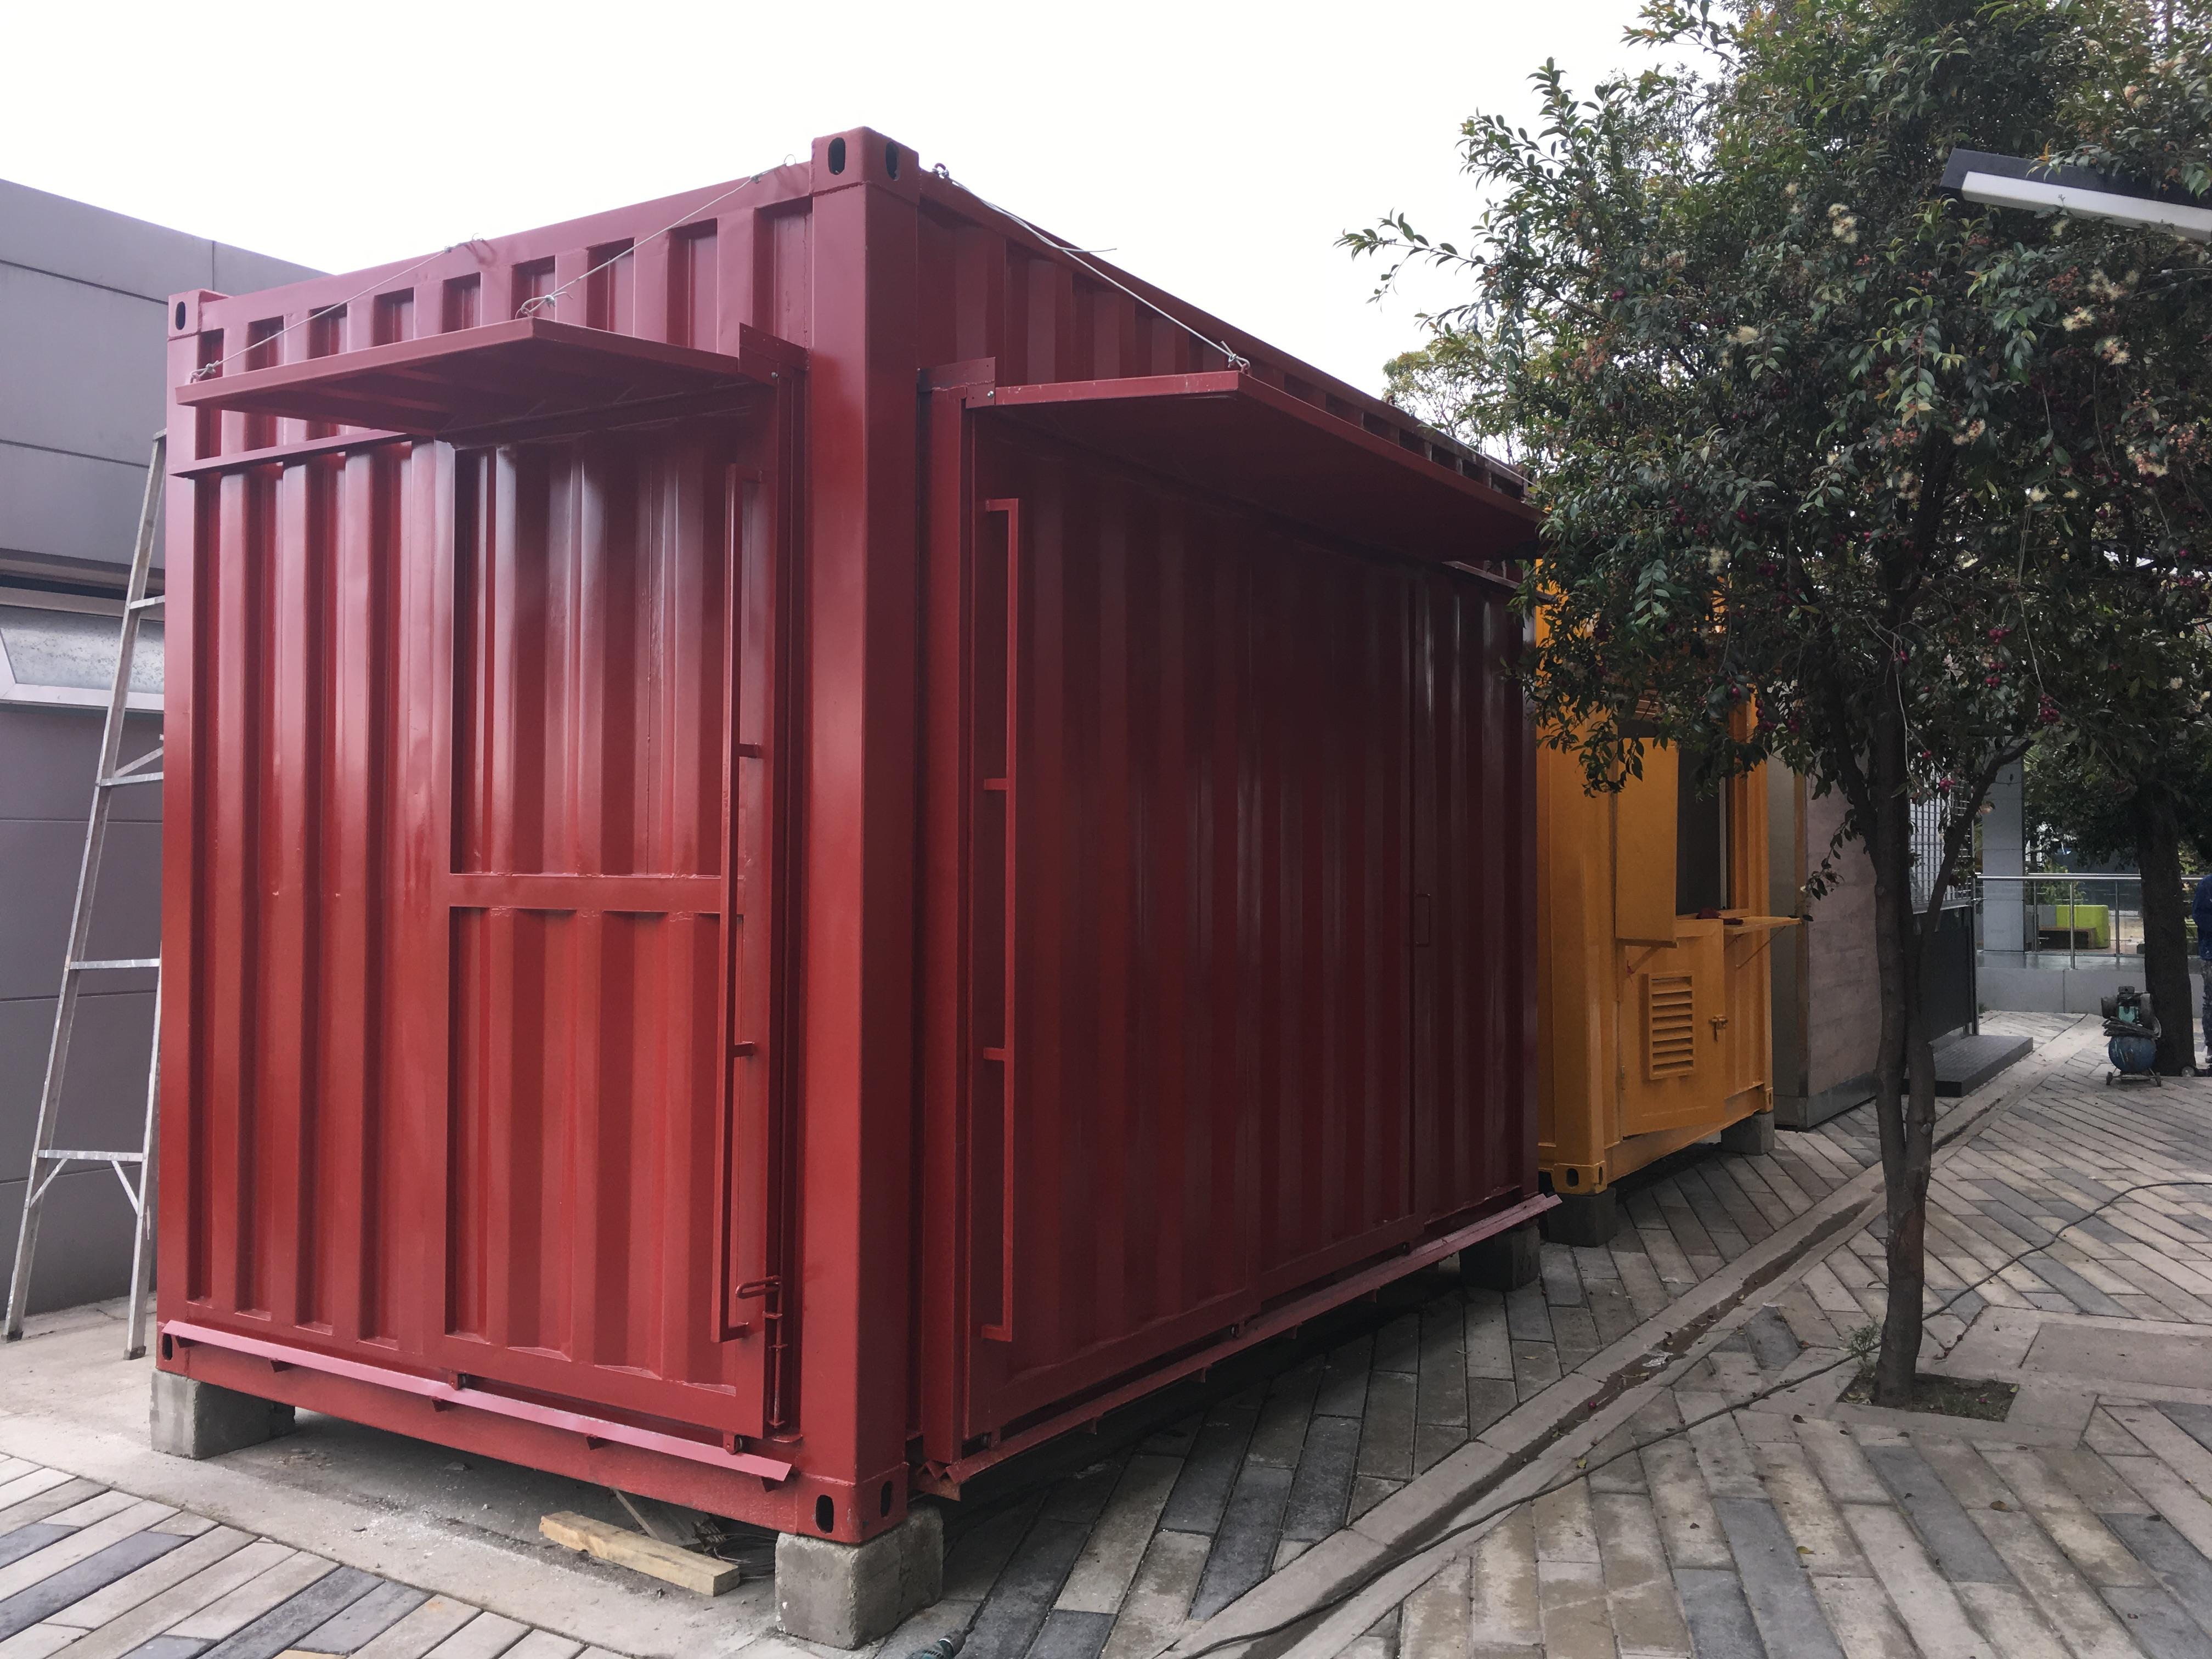 Restaurante en containers